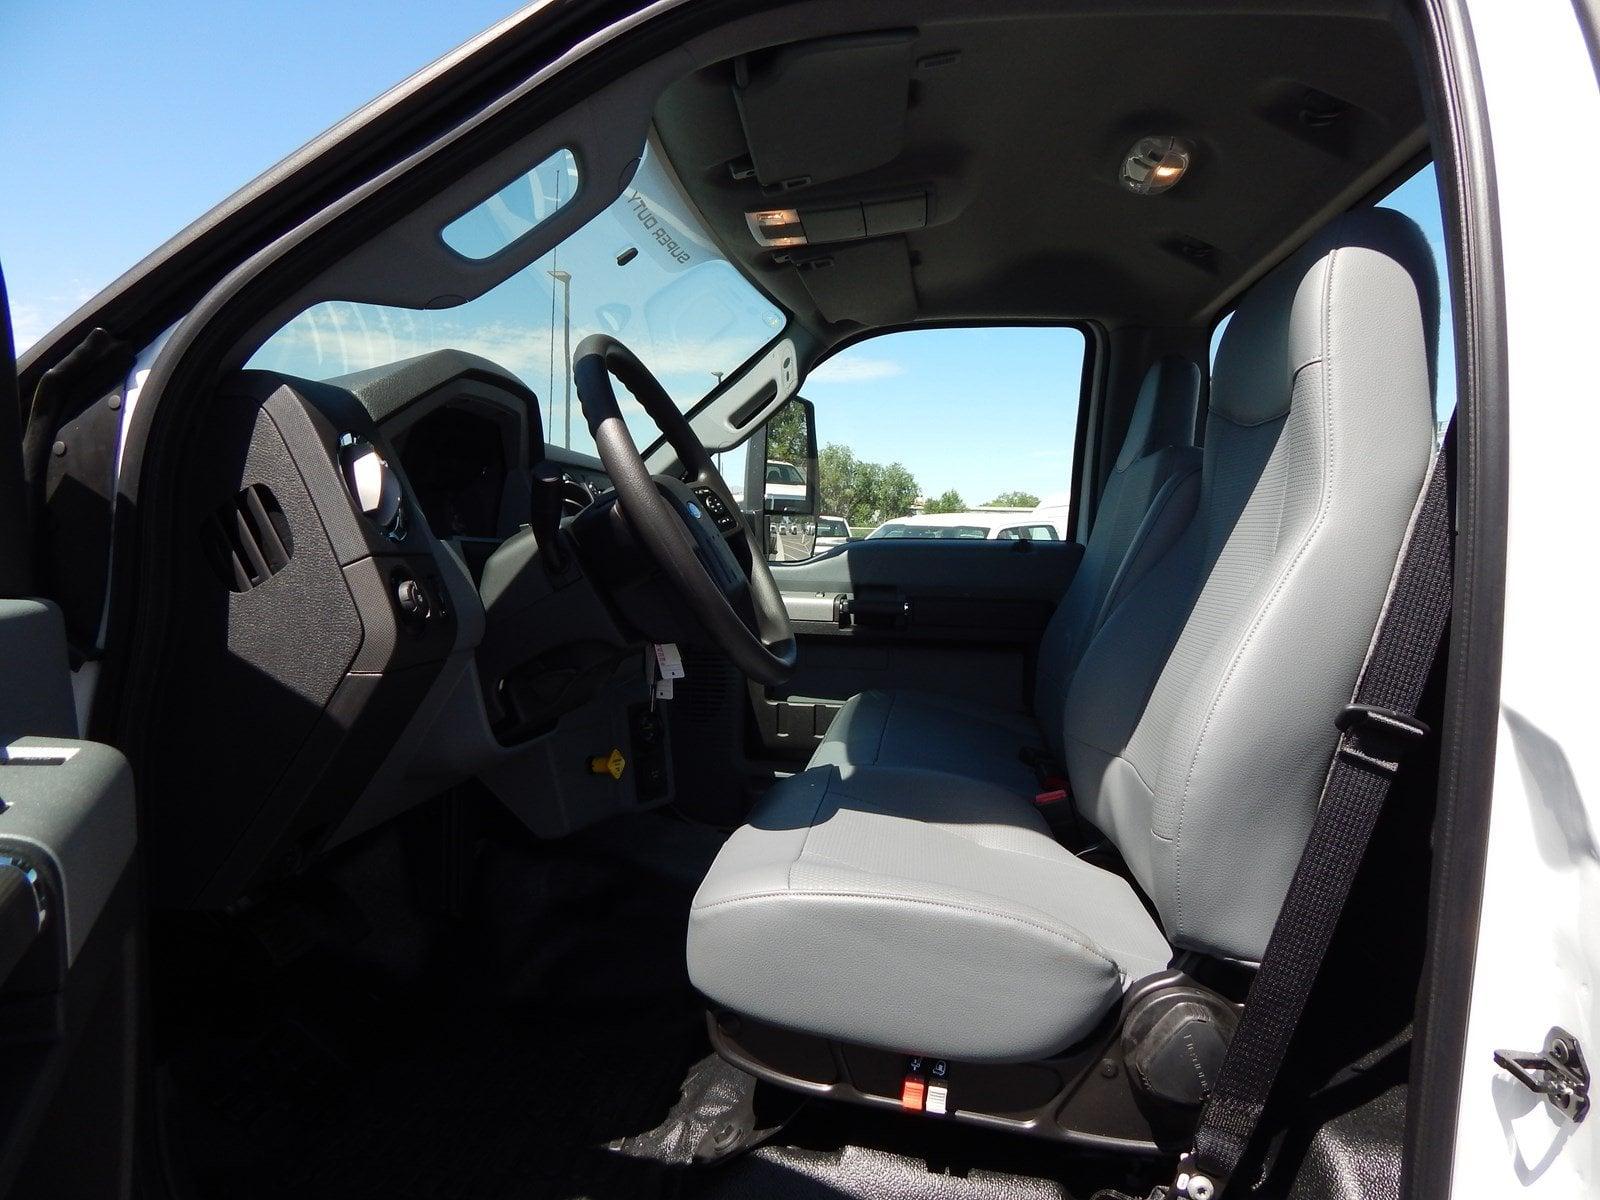 2018 F-650 Regular Cab DRW 4x2,  Cab Chassis #68224 - photo 7